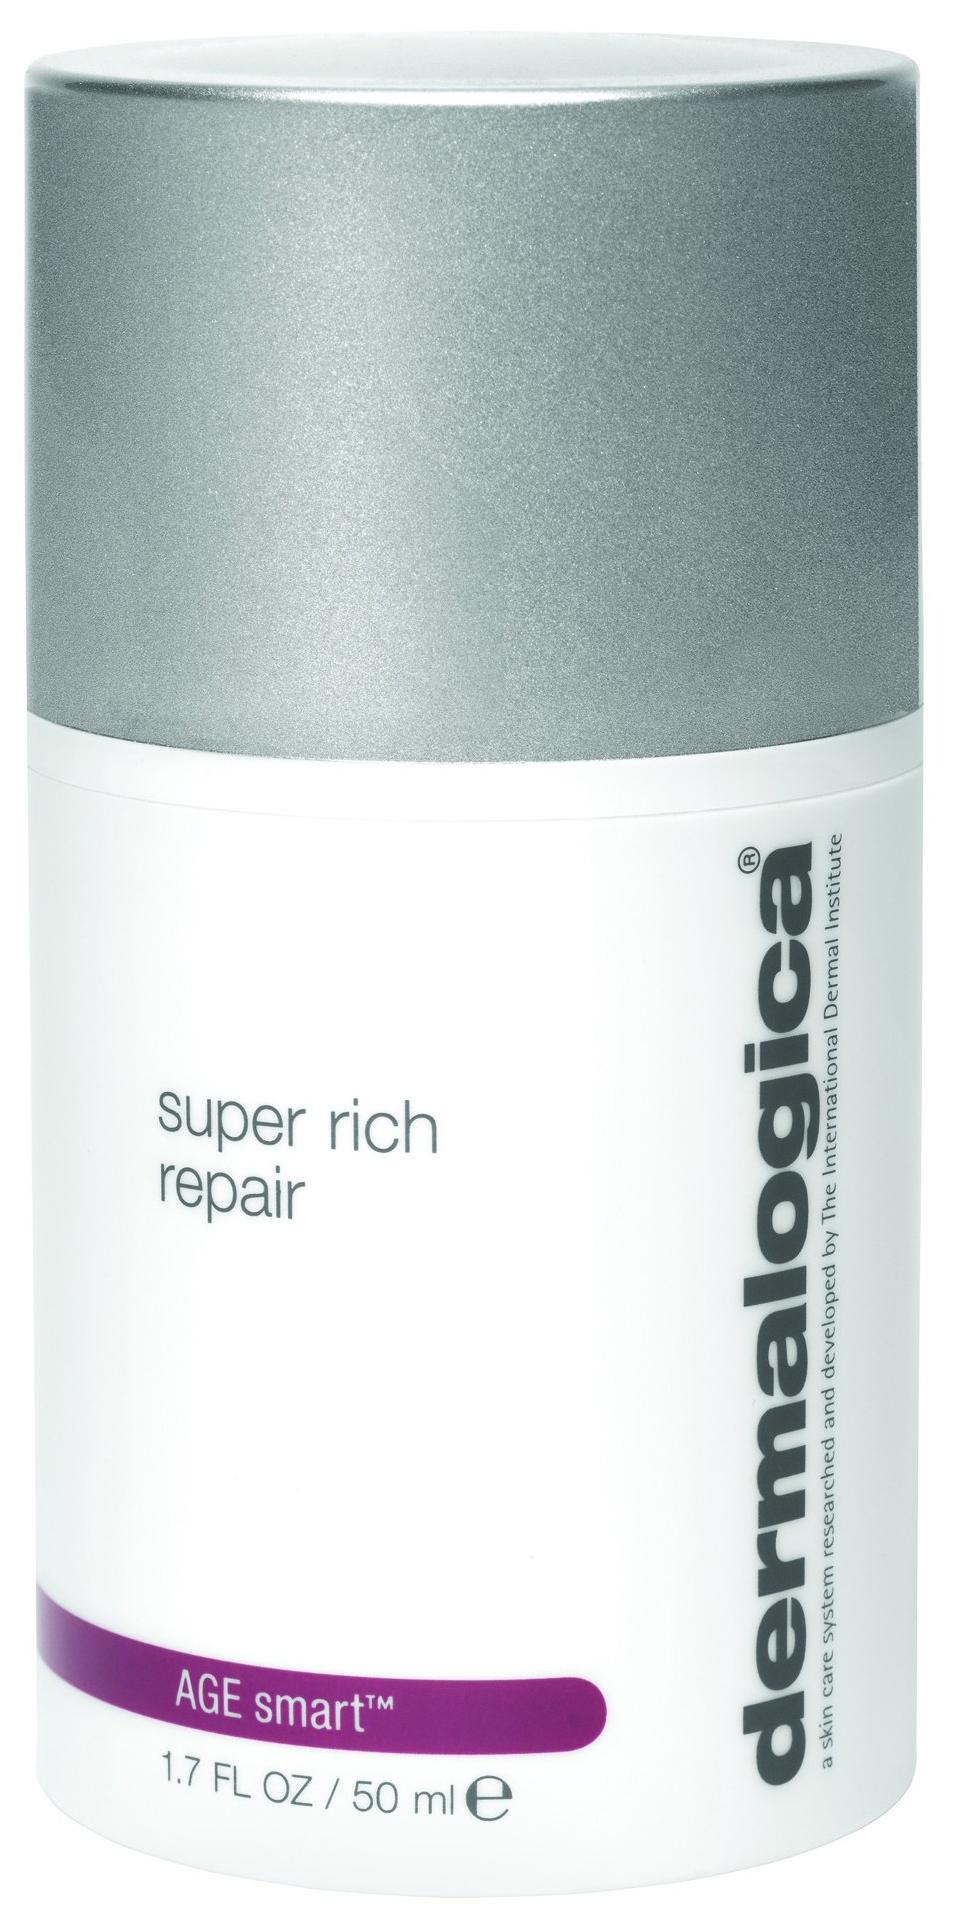 Крем для лица Dermalogica Super Rich Repair 50 мл фото